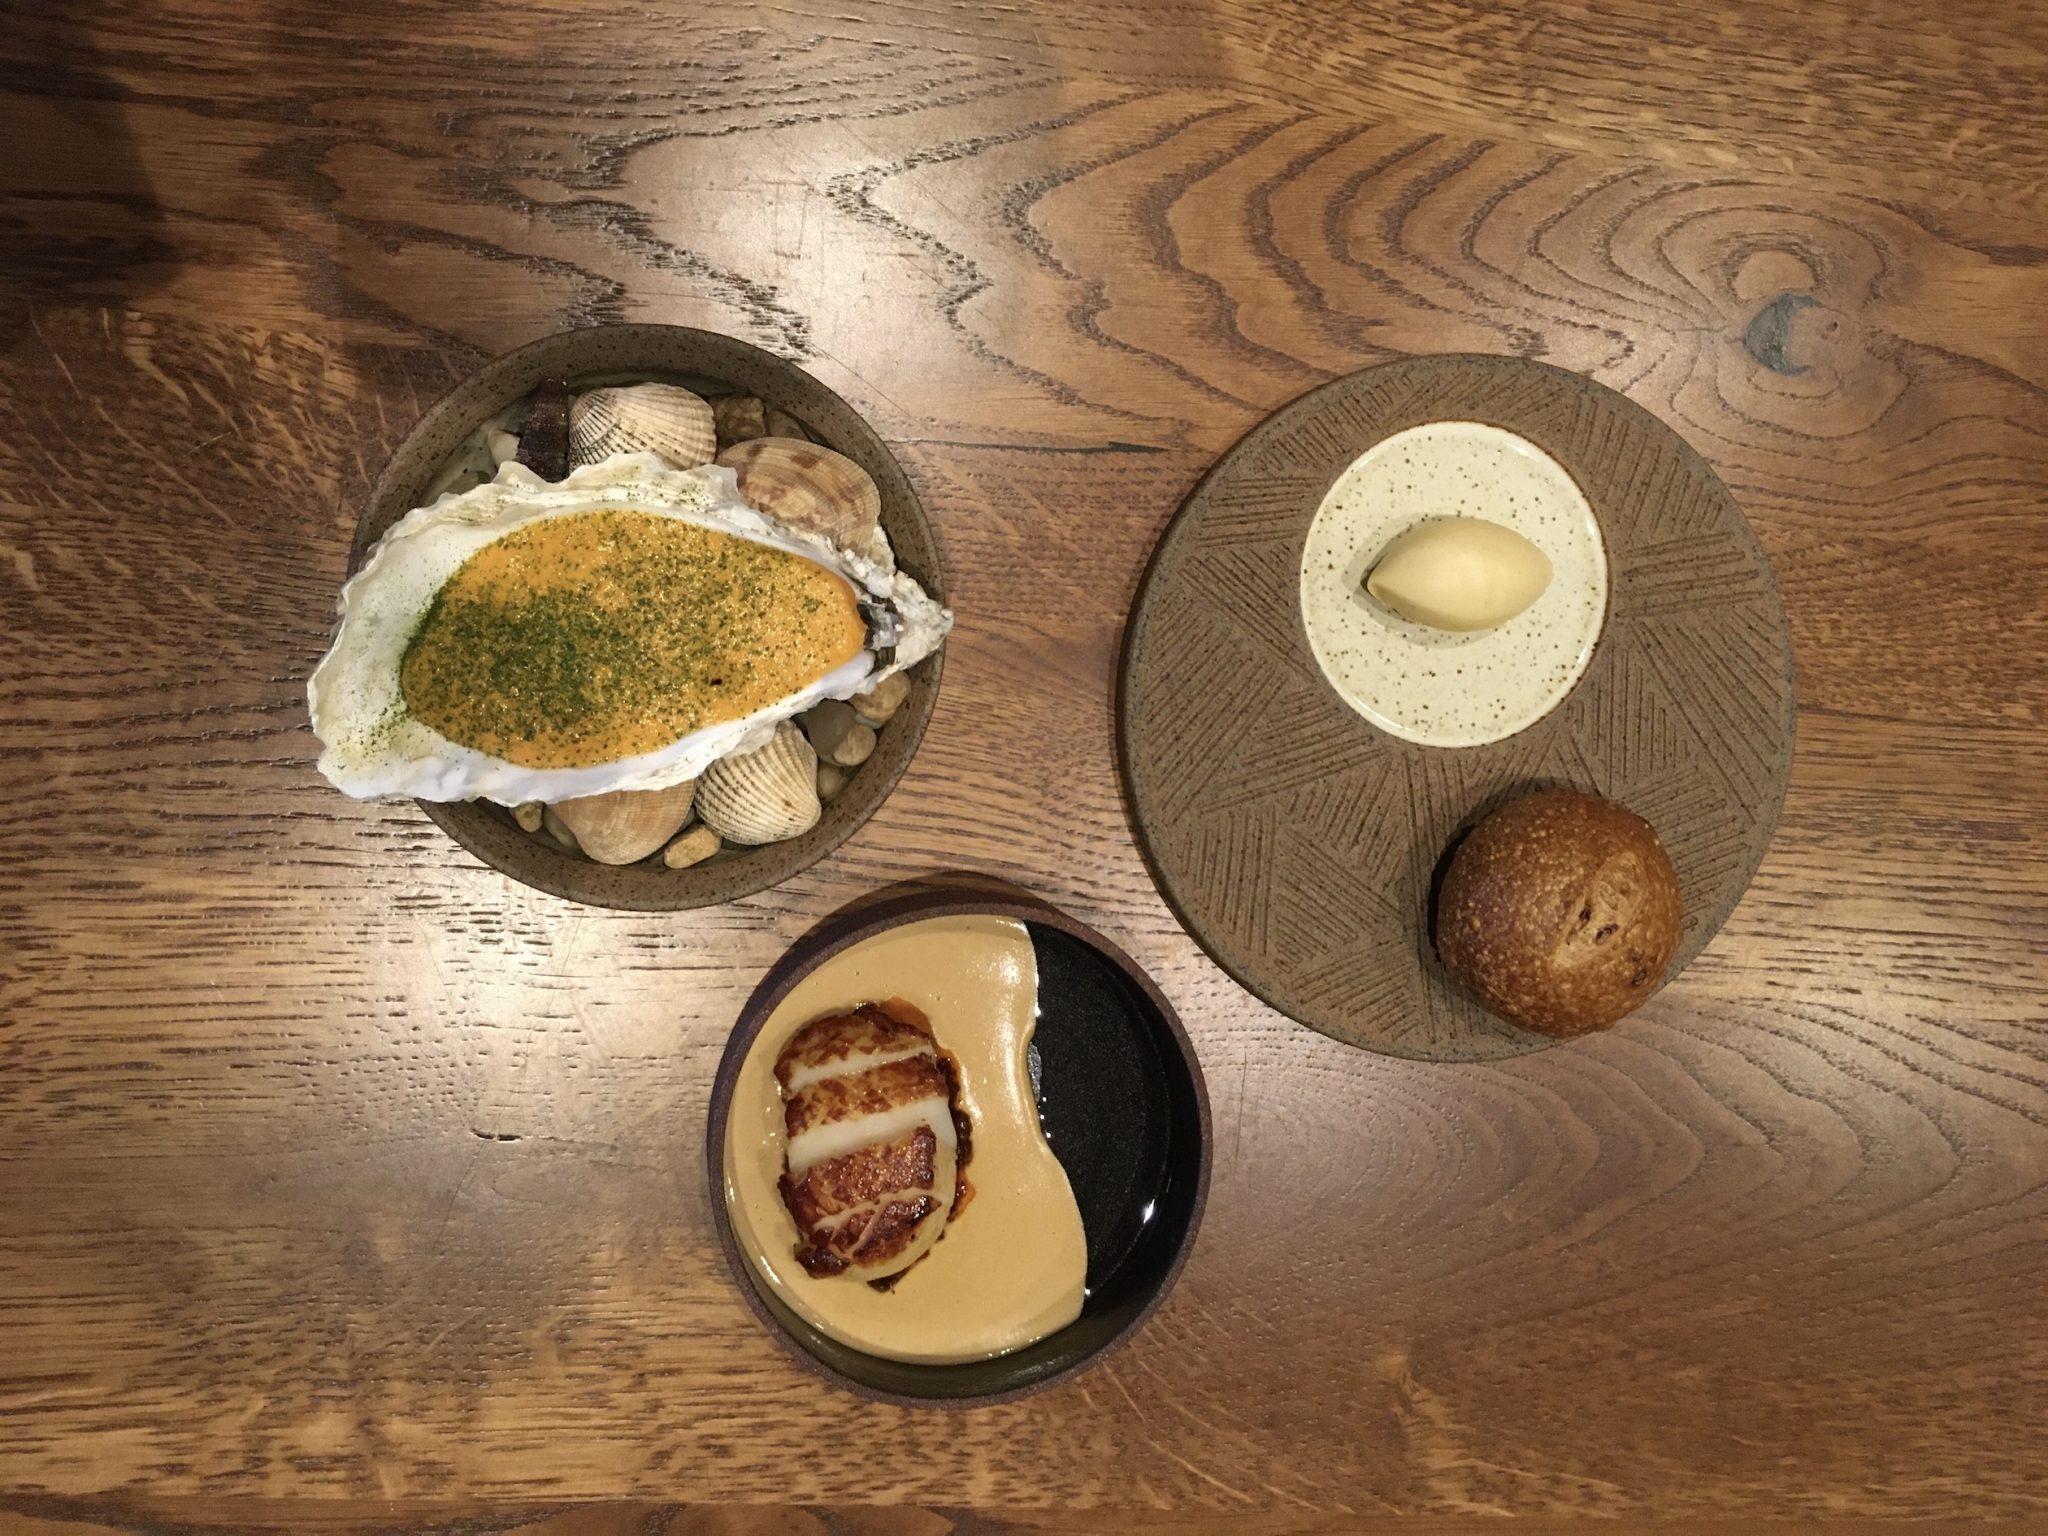 Akoko Gambian oyster and ofe nsala